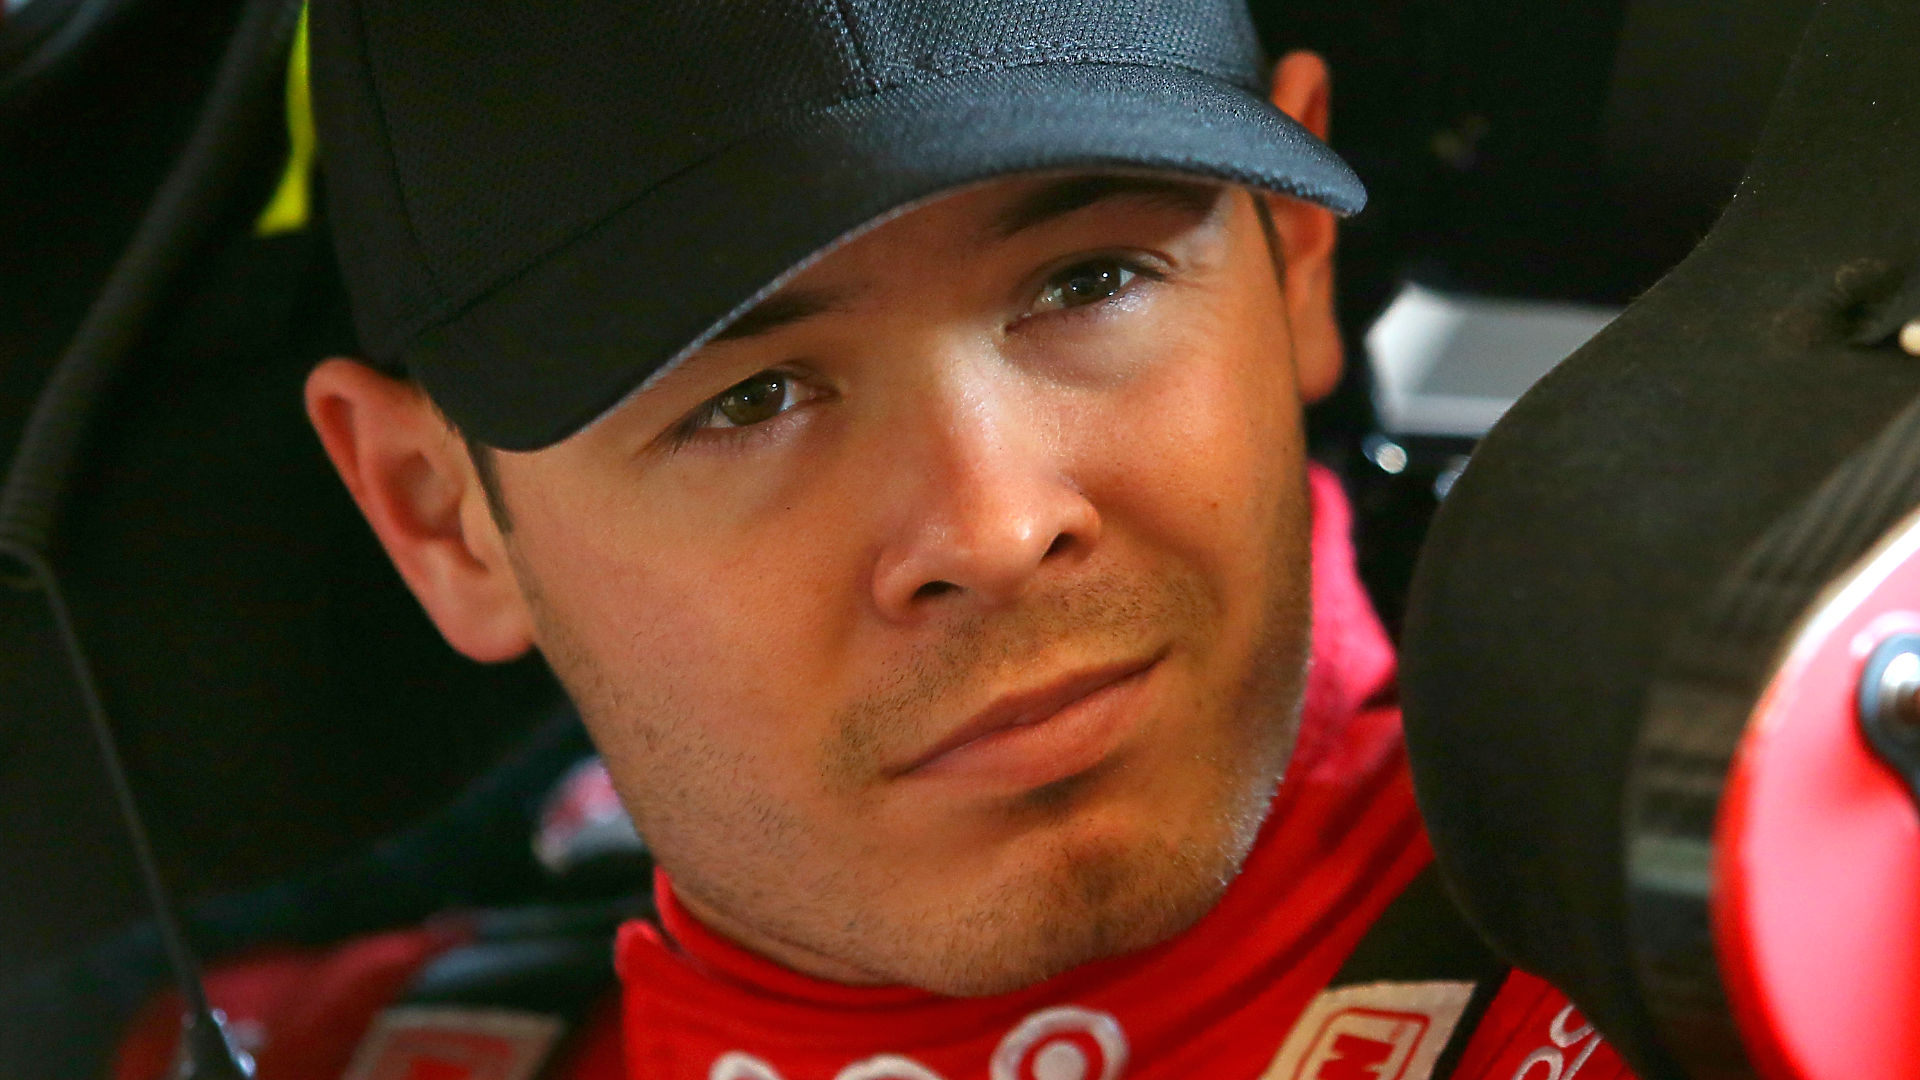 Martin Truex Jr. twins pole for Charlotte's NASCAR race